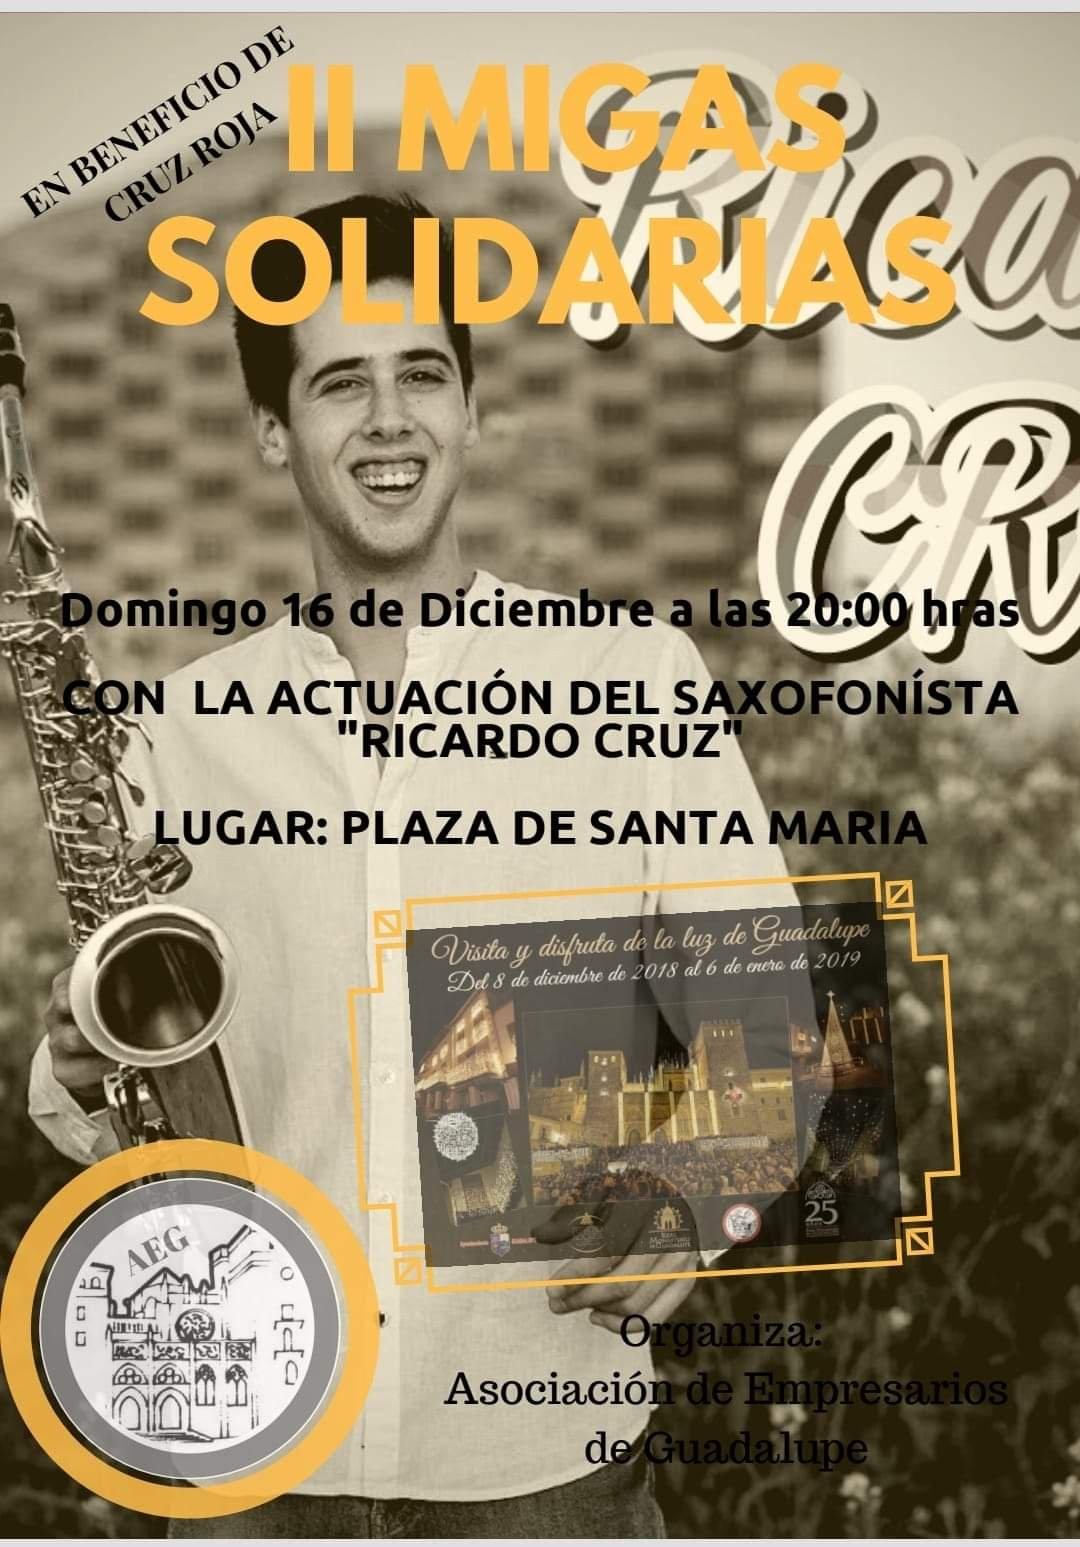 II Migas solidarias - Guadalupe (Cáceres)